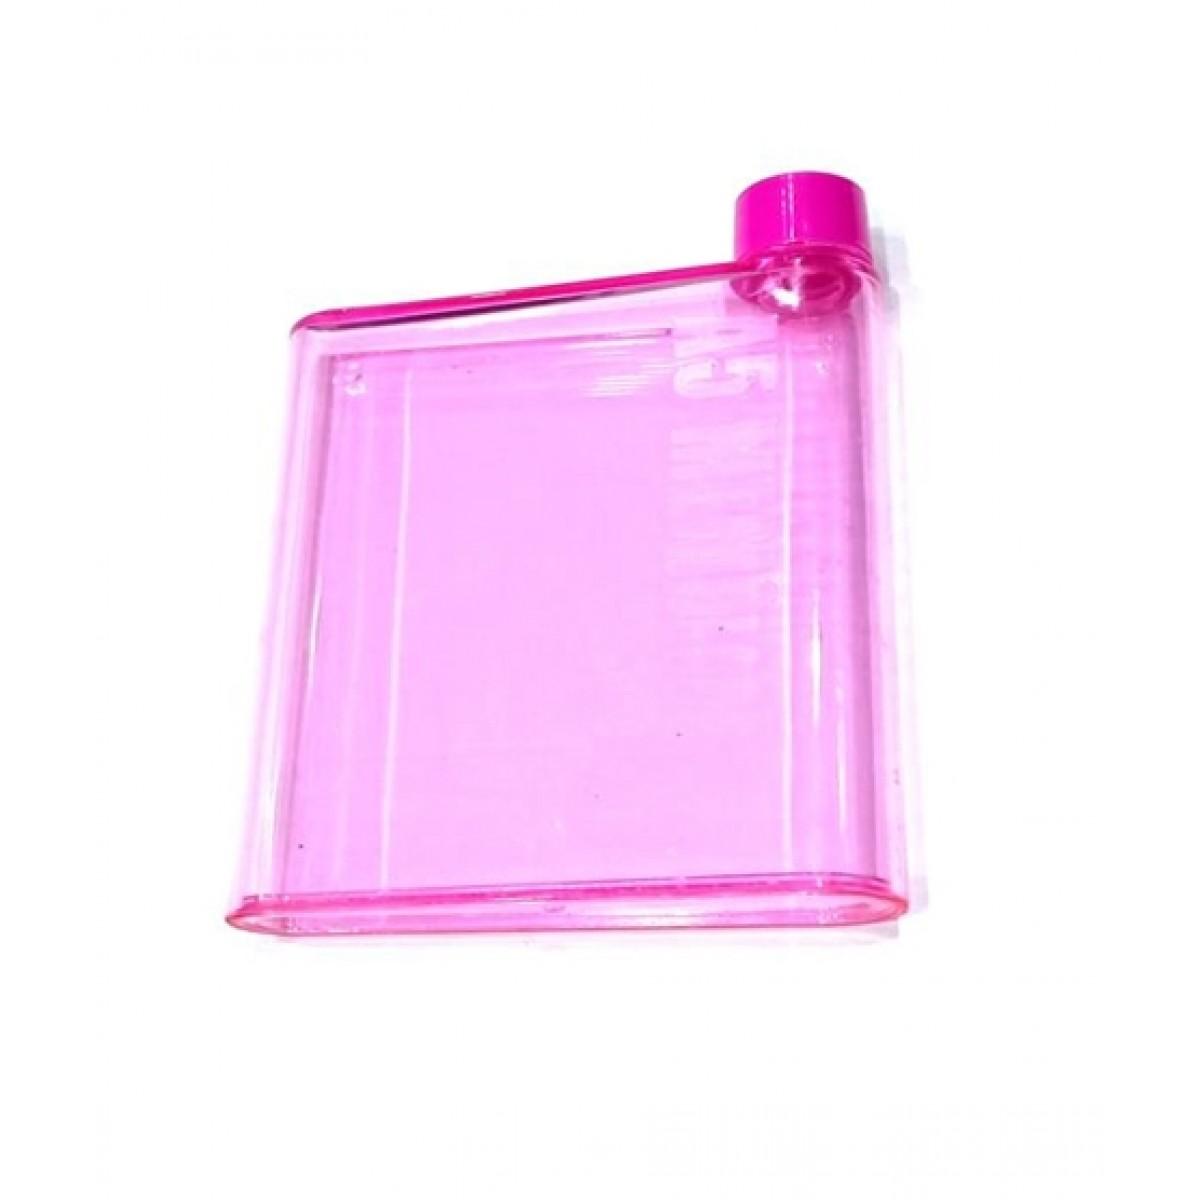 Quickshopping Water Bottle 380ml (1309)